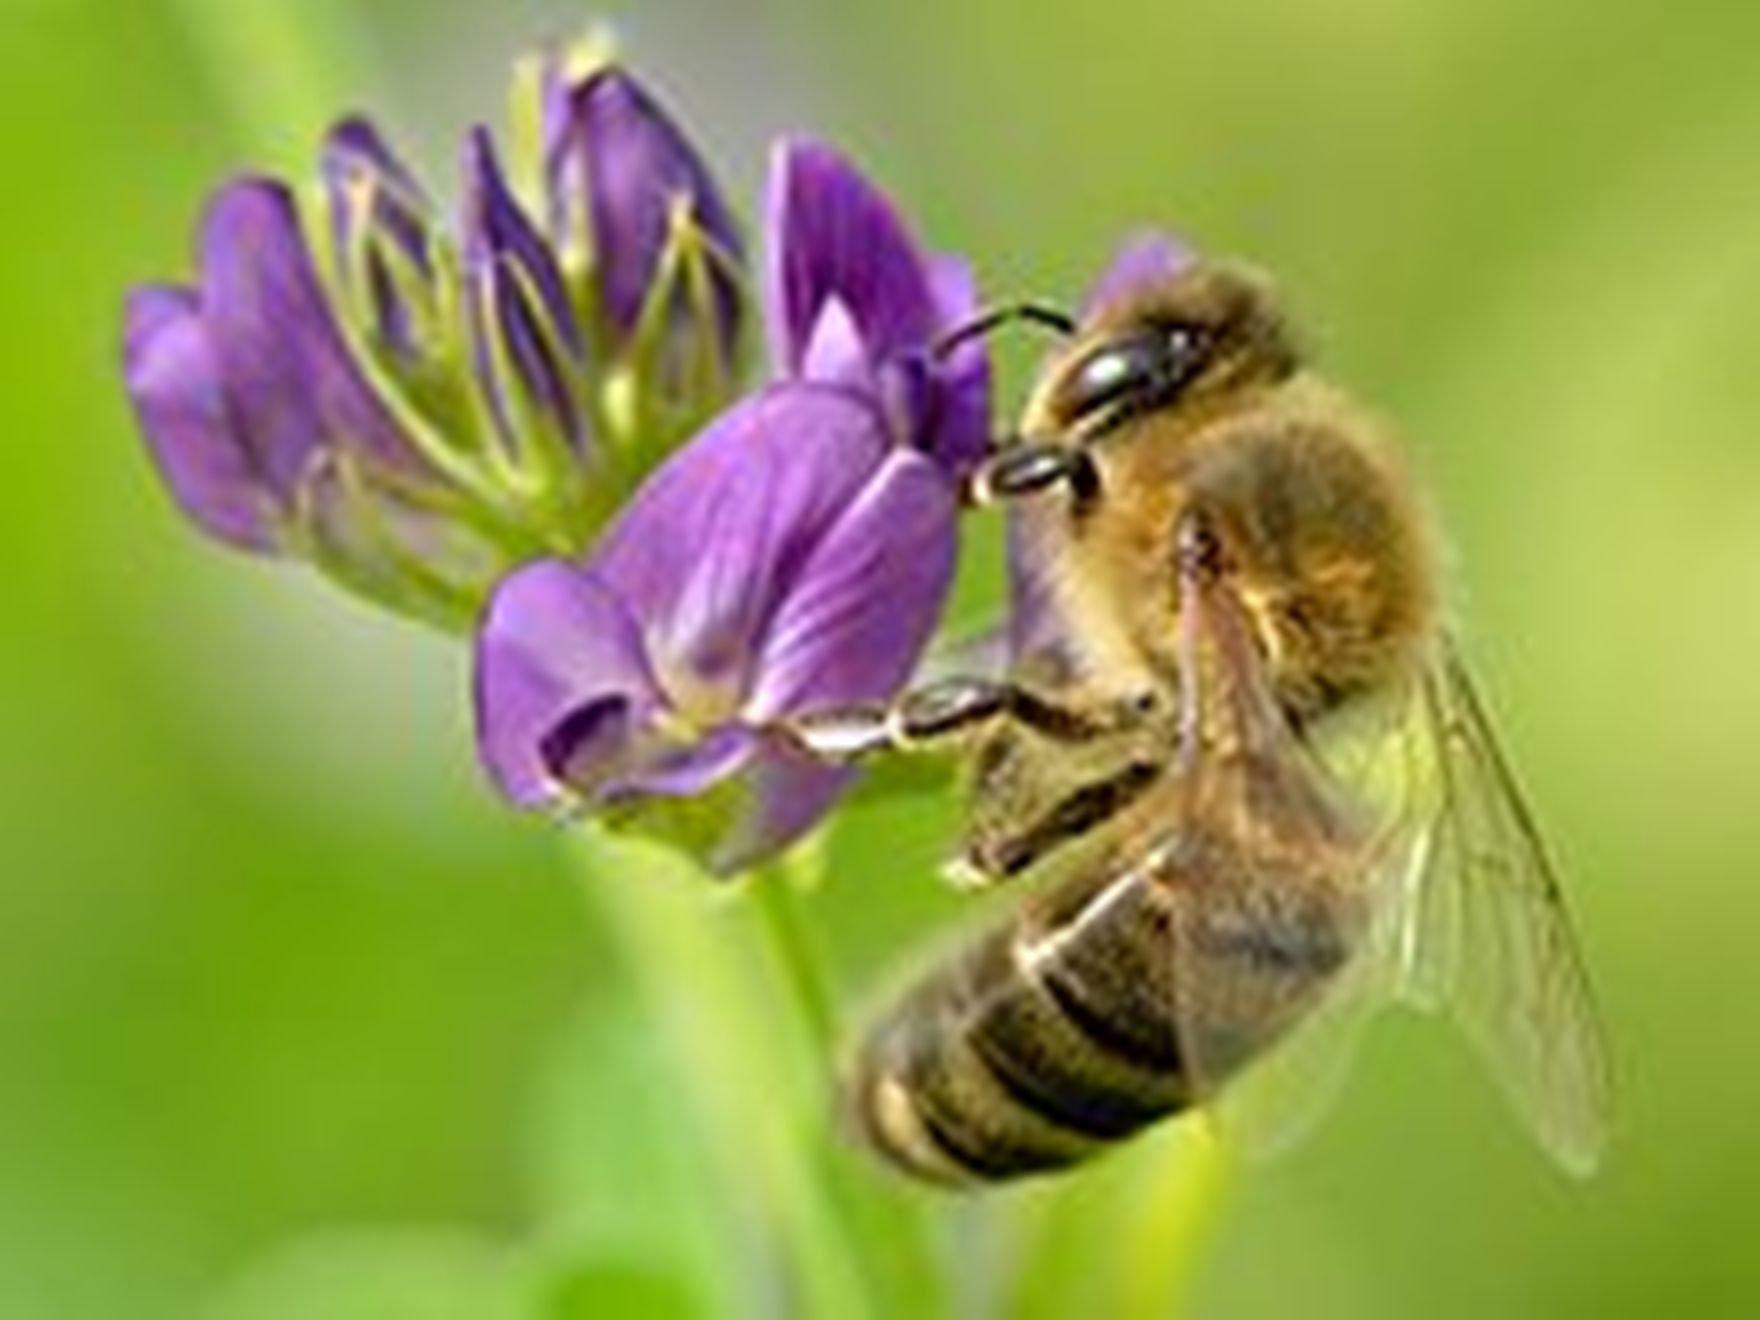 1 Lb ALFALFA SEEDS ORGANIC Seeds Non-GMO SuperFood (1 Lb)